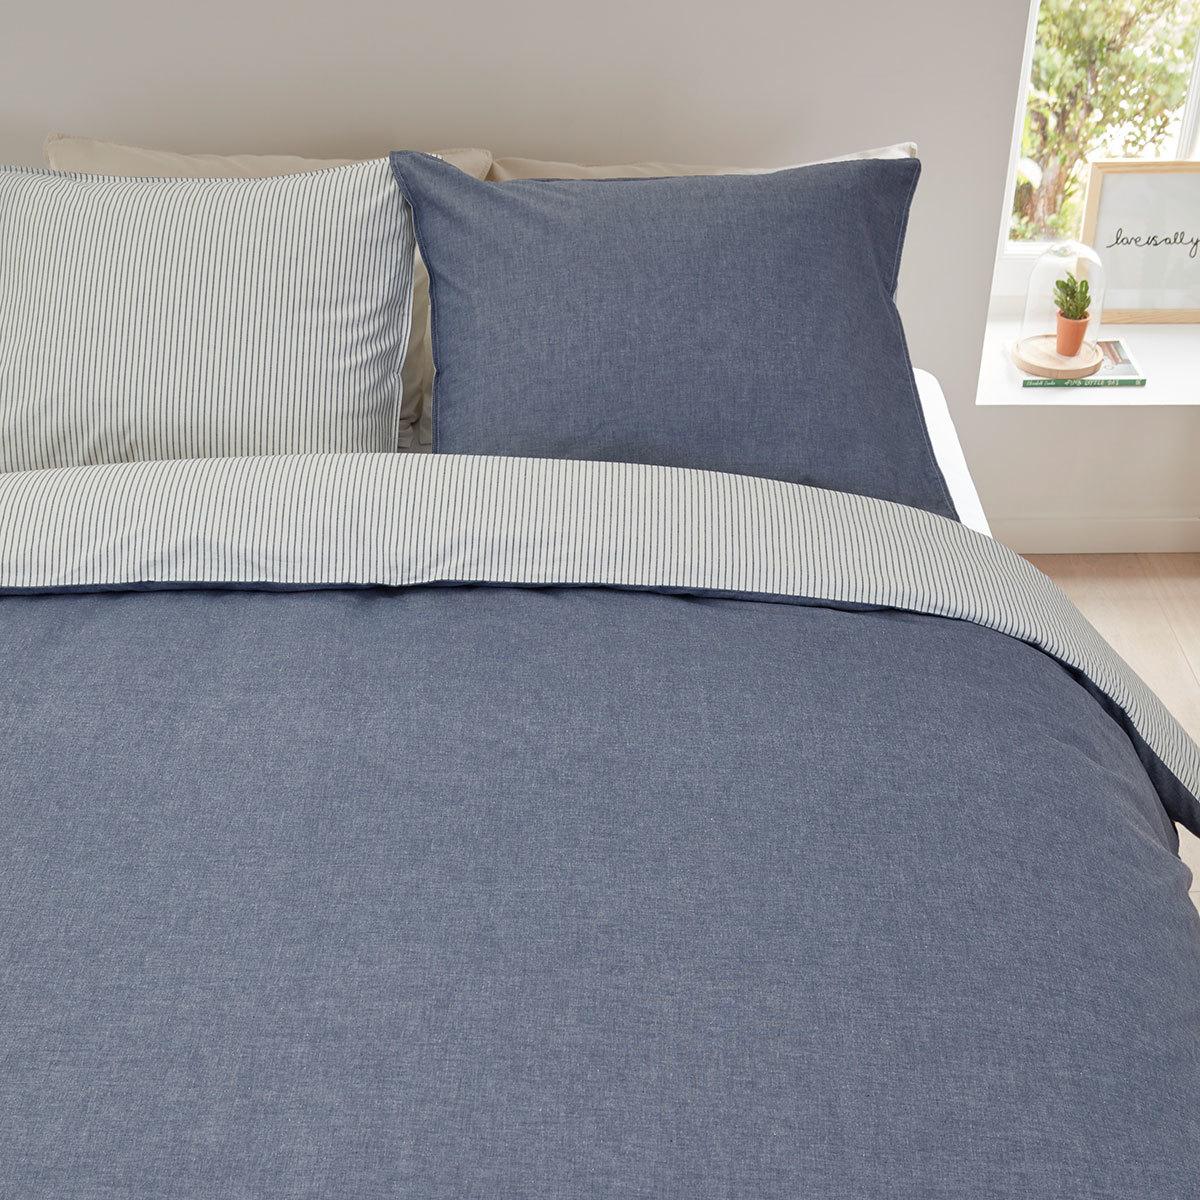 beddinghouse bettw sche cloud blau g nstig online kaufen bei bettwaren shop. Black Bedroom Furniture Sets. Home Design Ideas